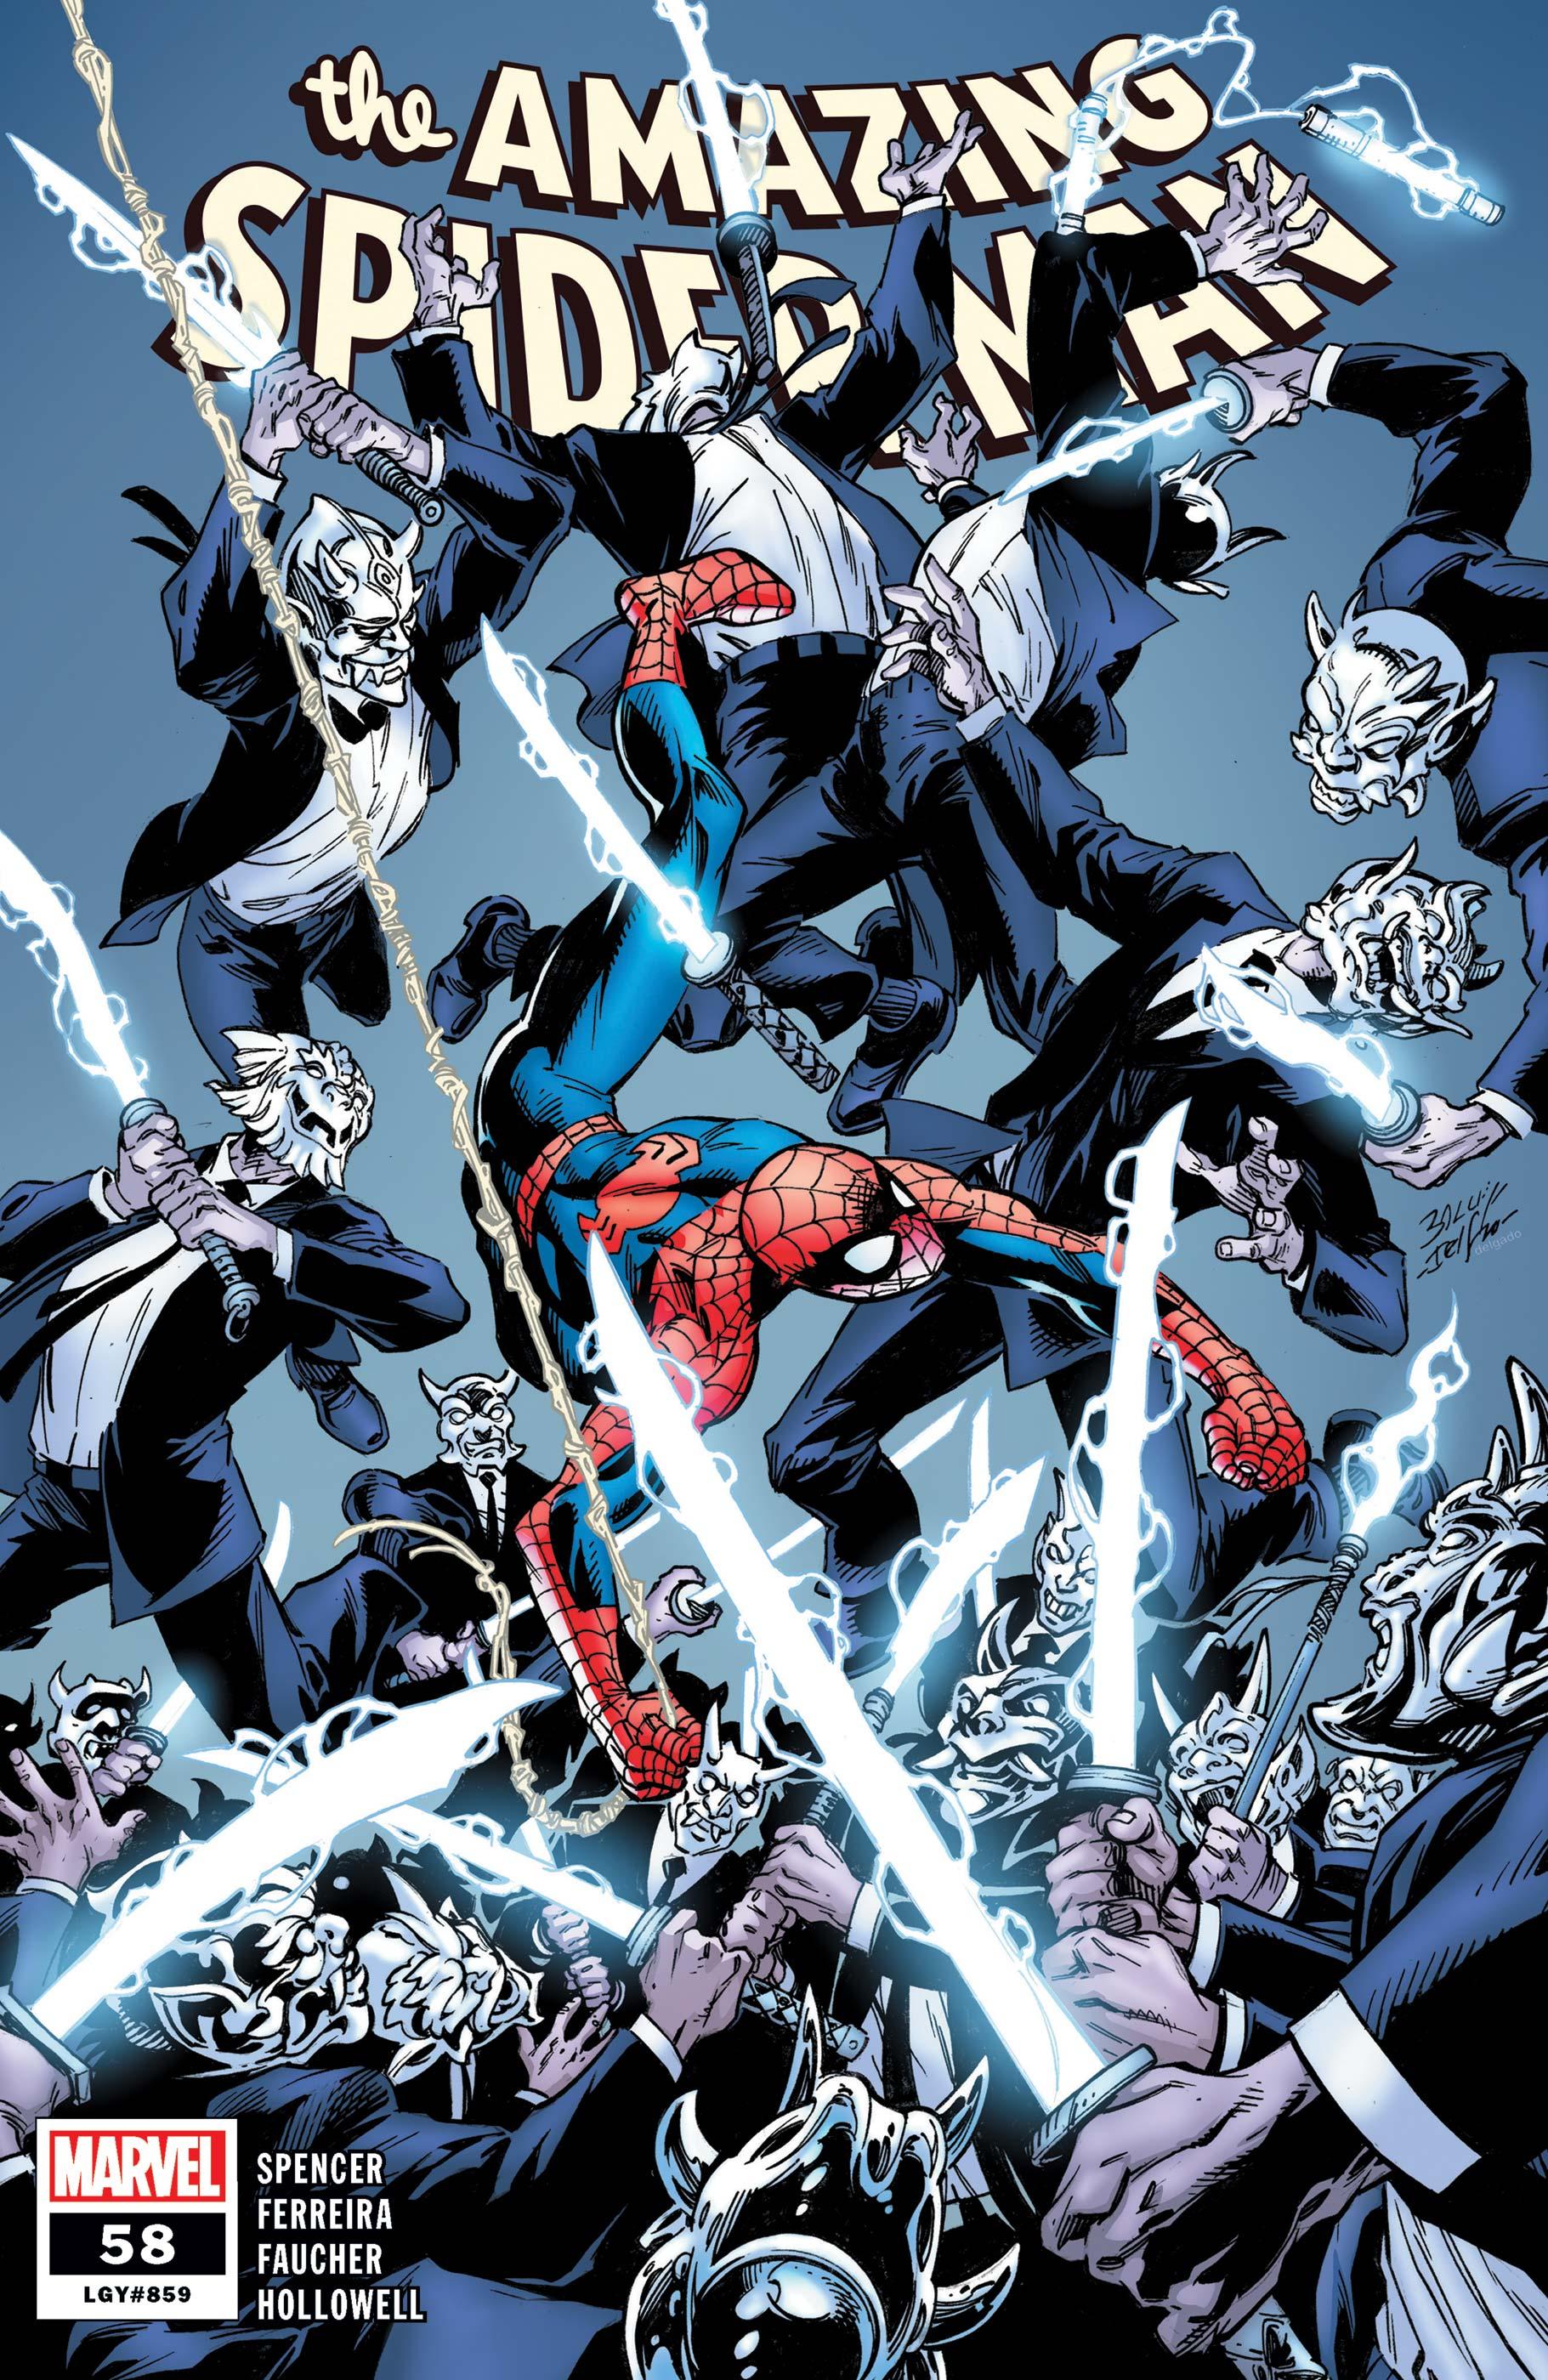 The Amazing Spider-Man (2018) #58